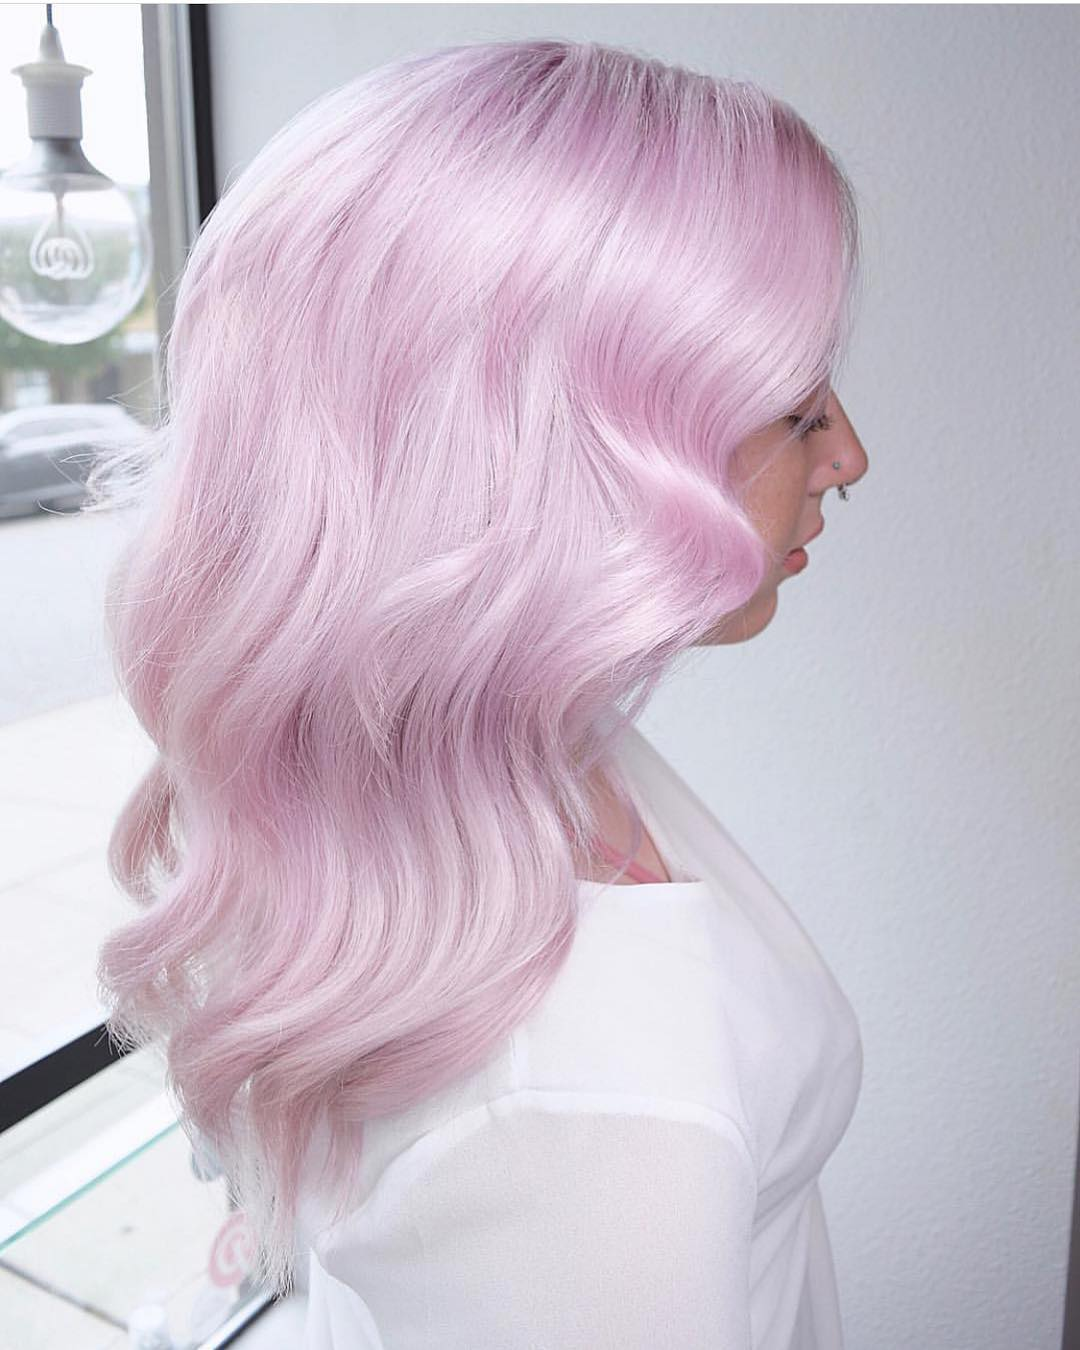 розовое окрашивание фото 4